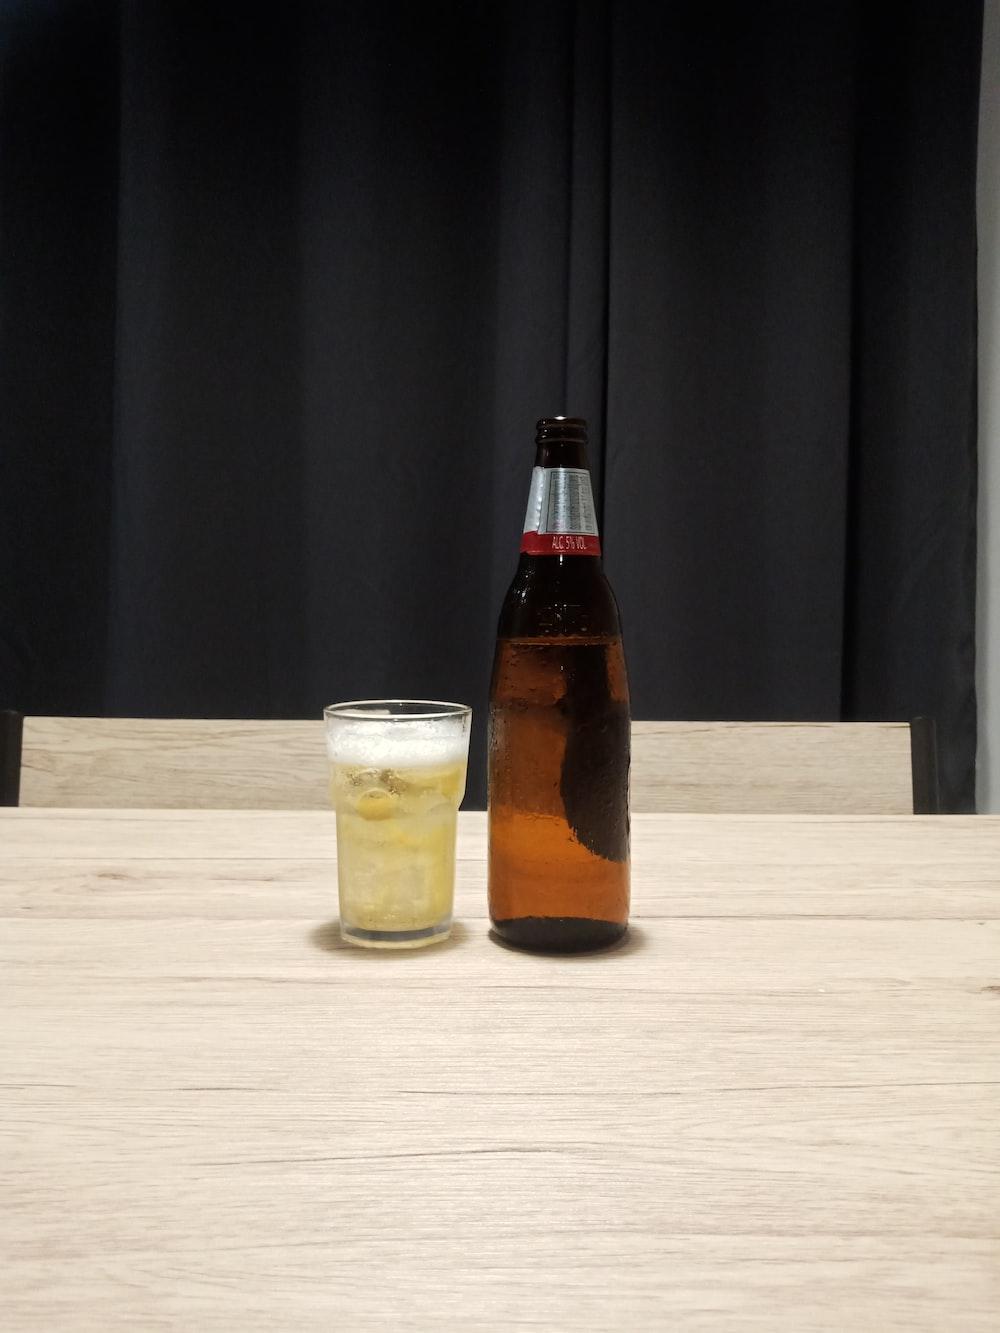 brown glass bottle